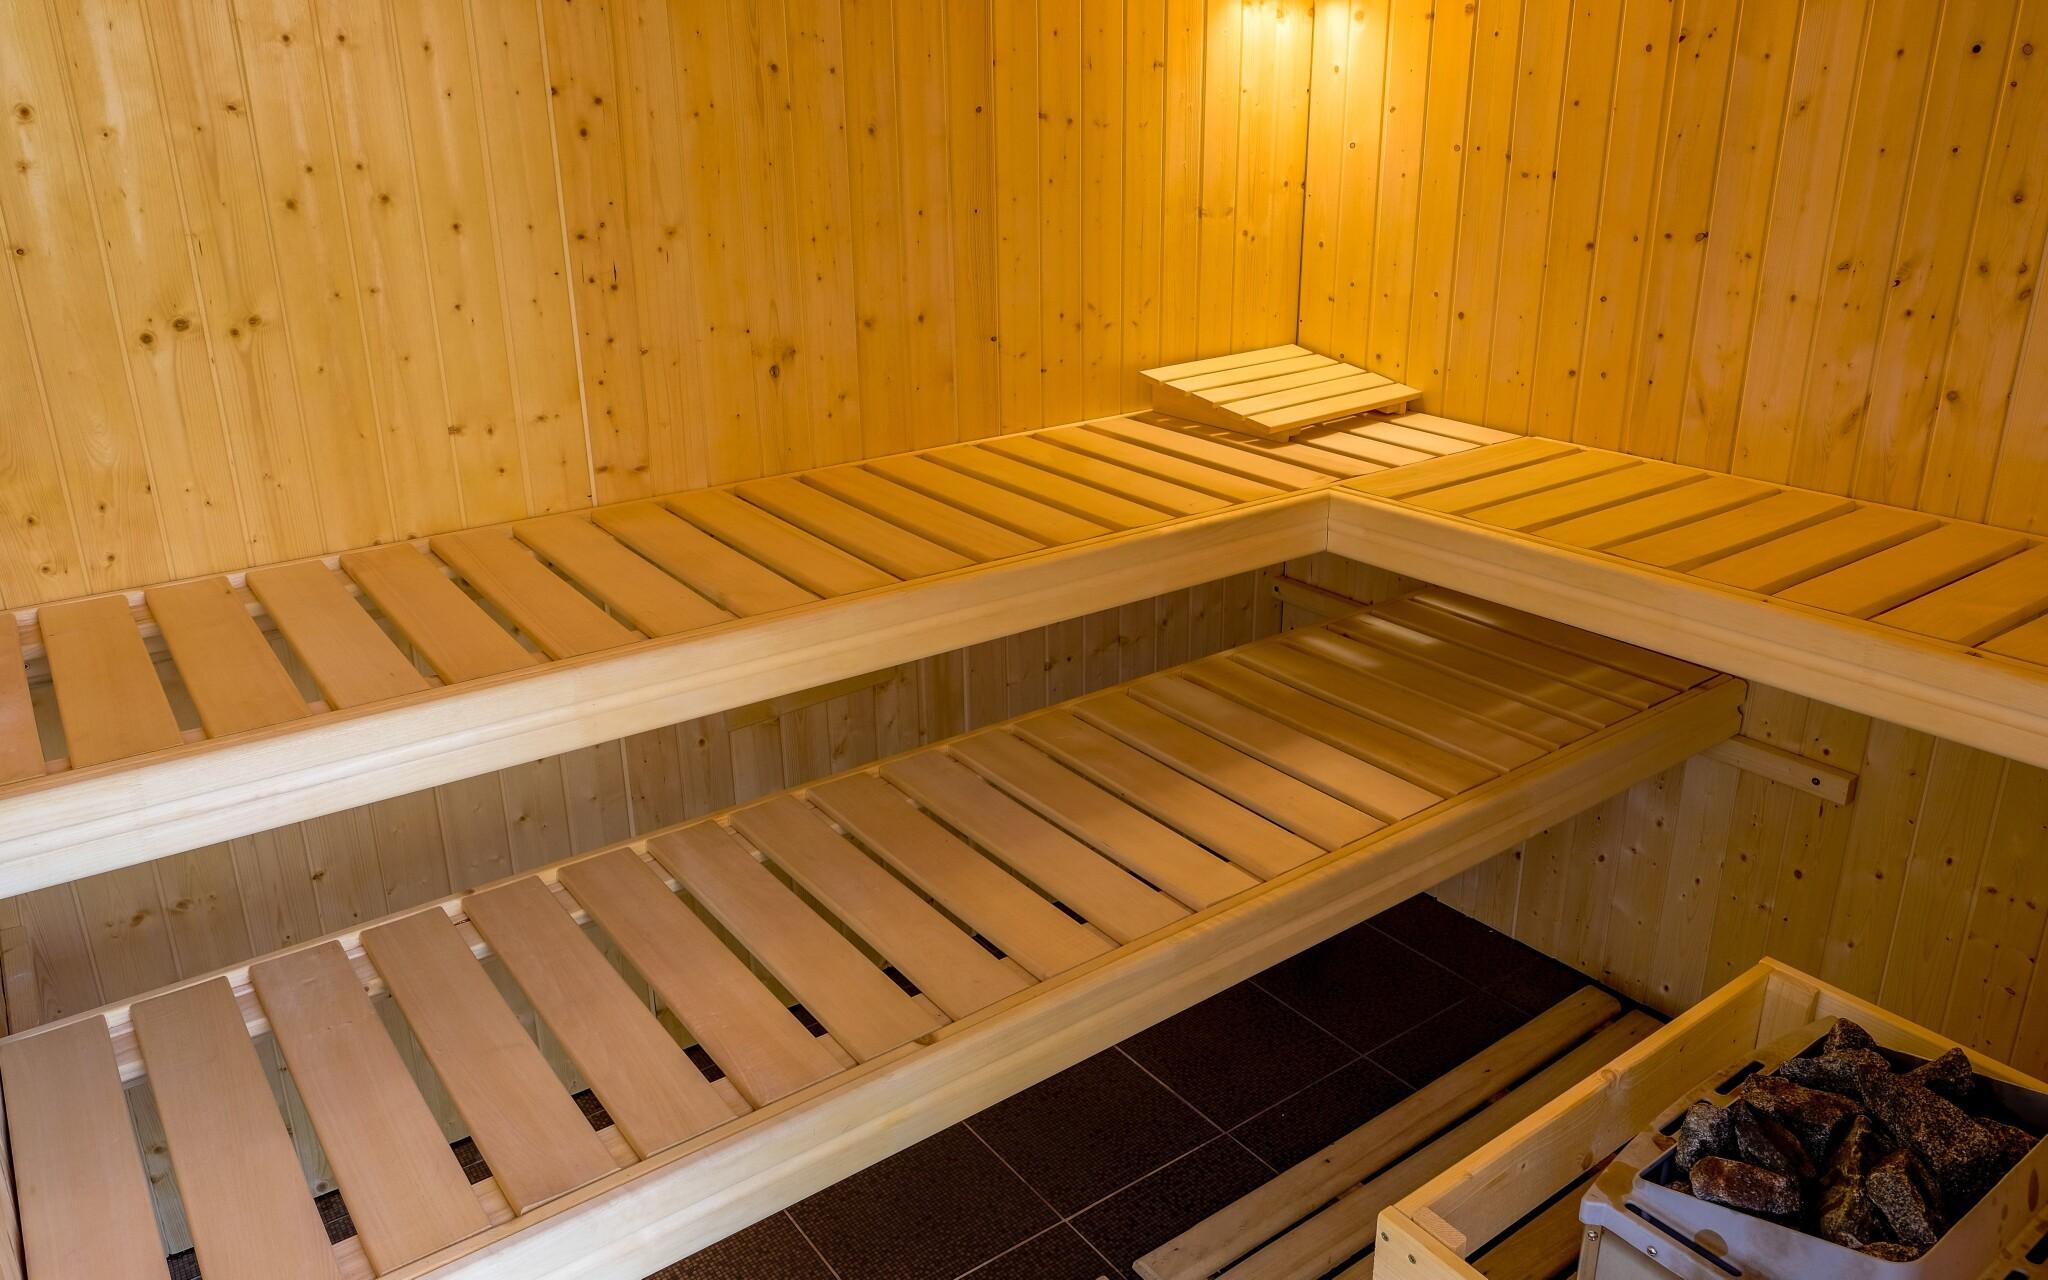 Zajděte si do wellness s finskou saunou